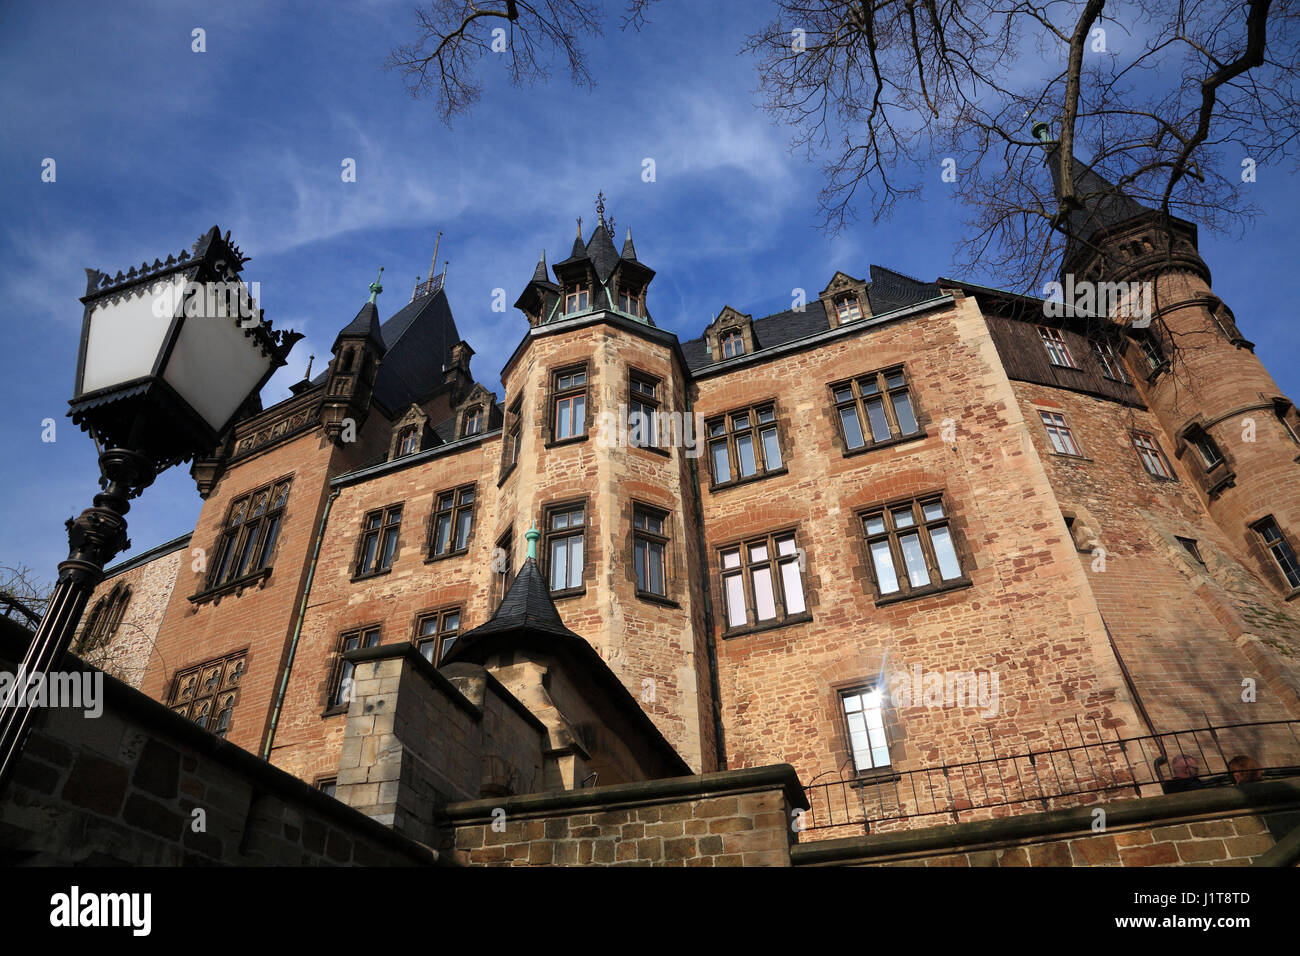 Castle, Wernigerode, Saxony-Anhalt, Germany, Europe - Stock Image